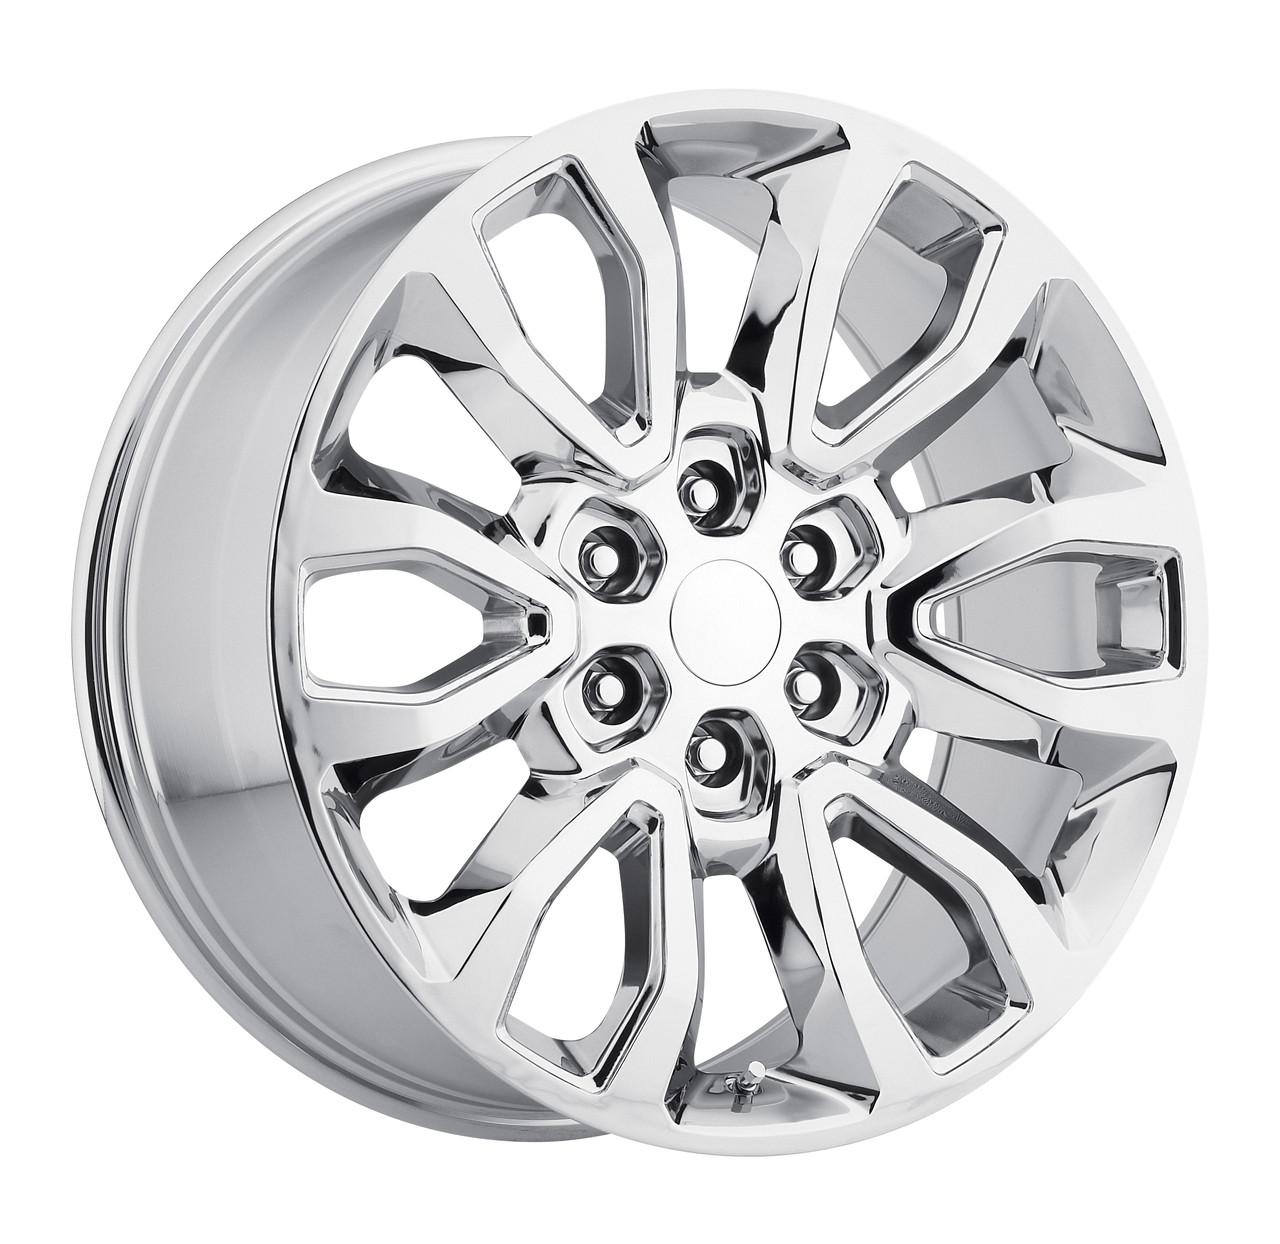 20 fits ford f150 6 lug wheels chrome raptor style set of 4 20x9